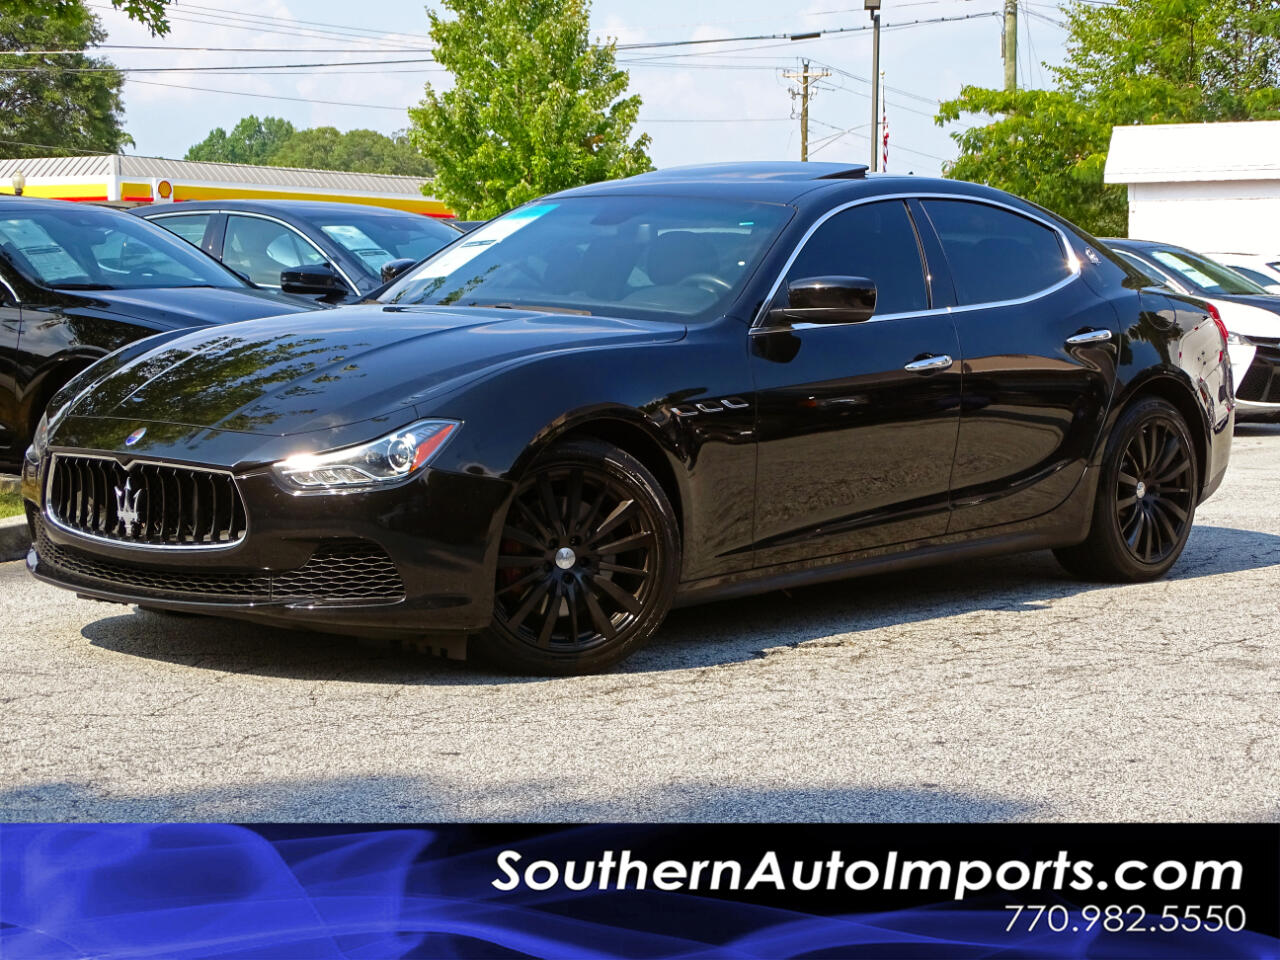 2016 Maserati Ghibli SDN w/Back up Camera Heated Seats